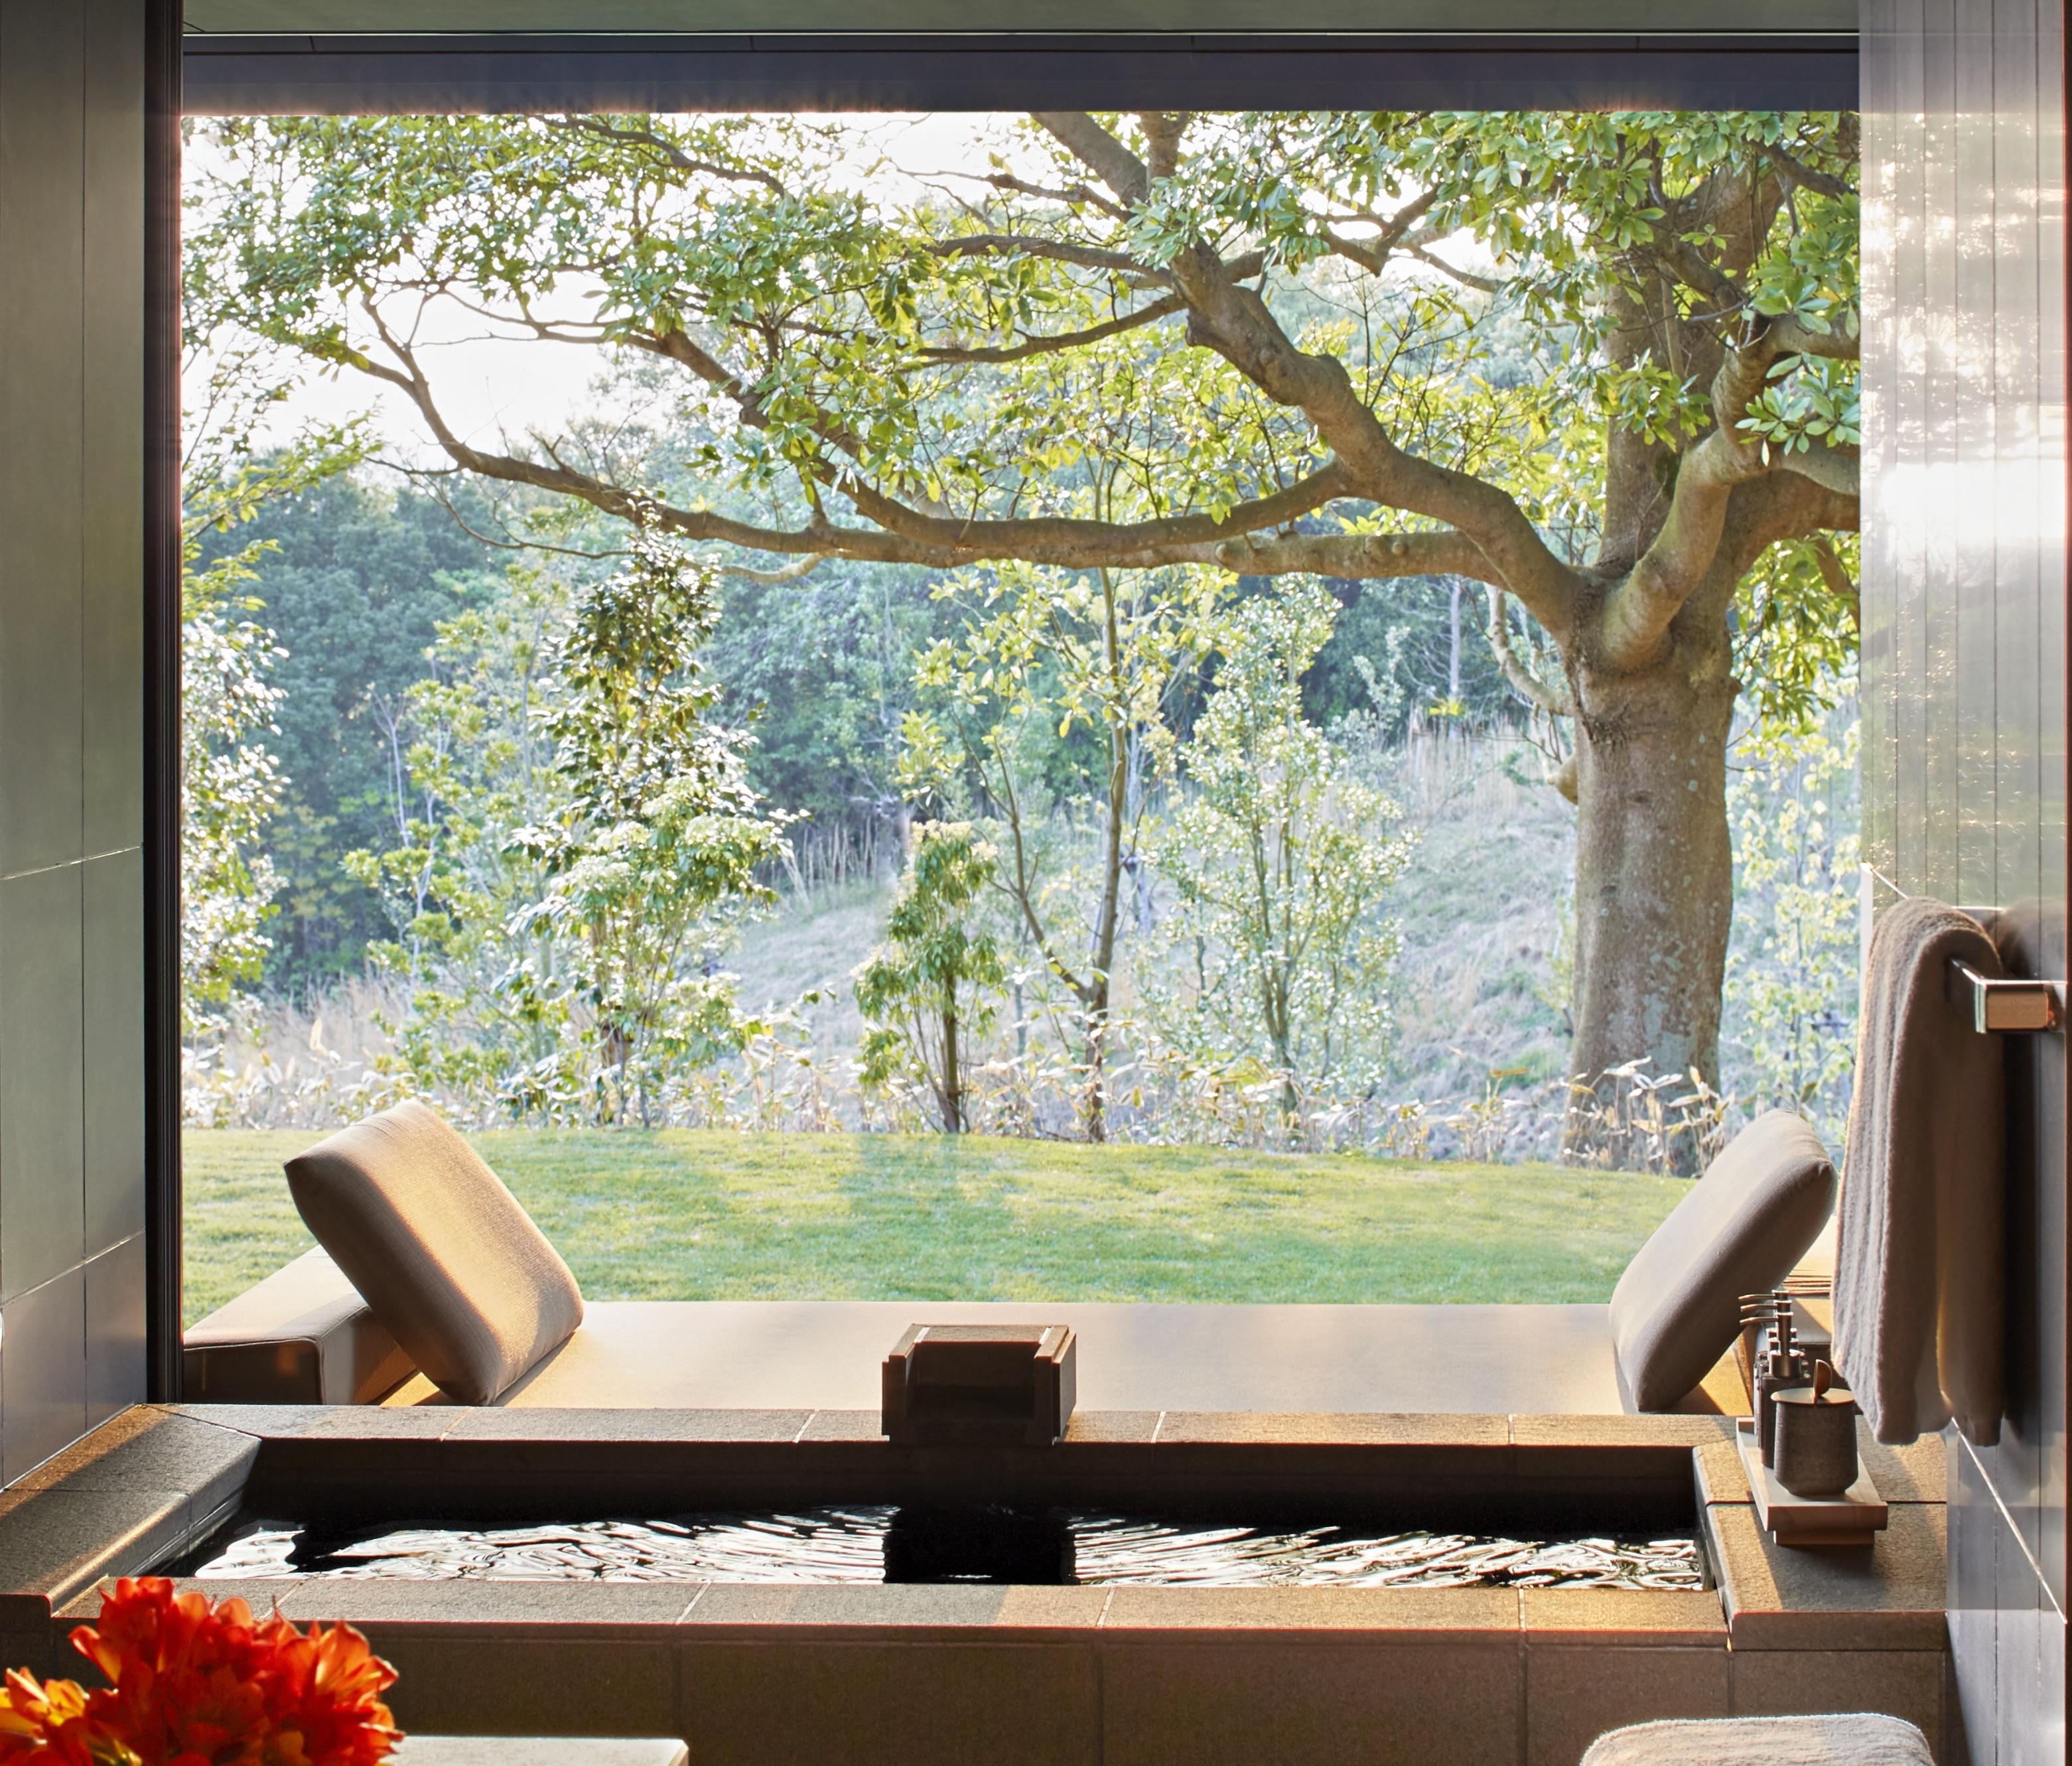 Top 2016 New Luxury Hotel Openings